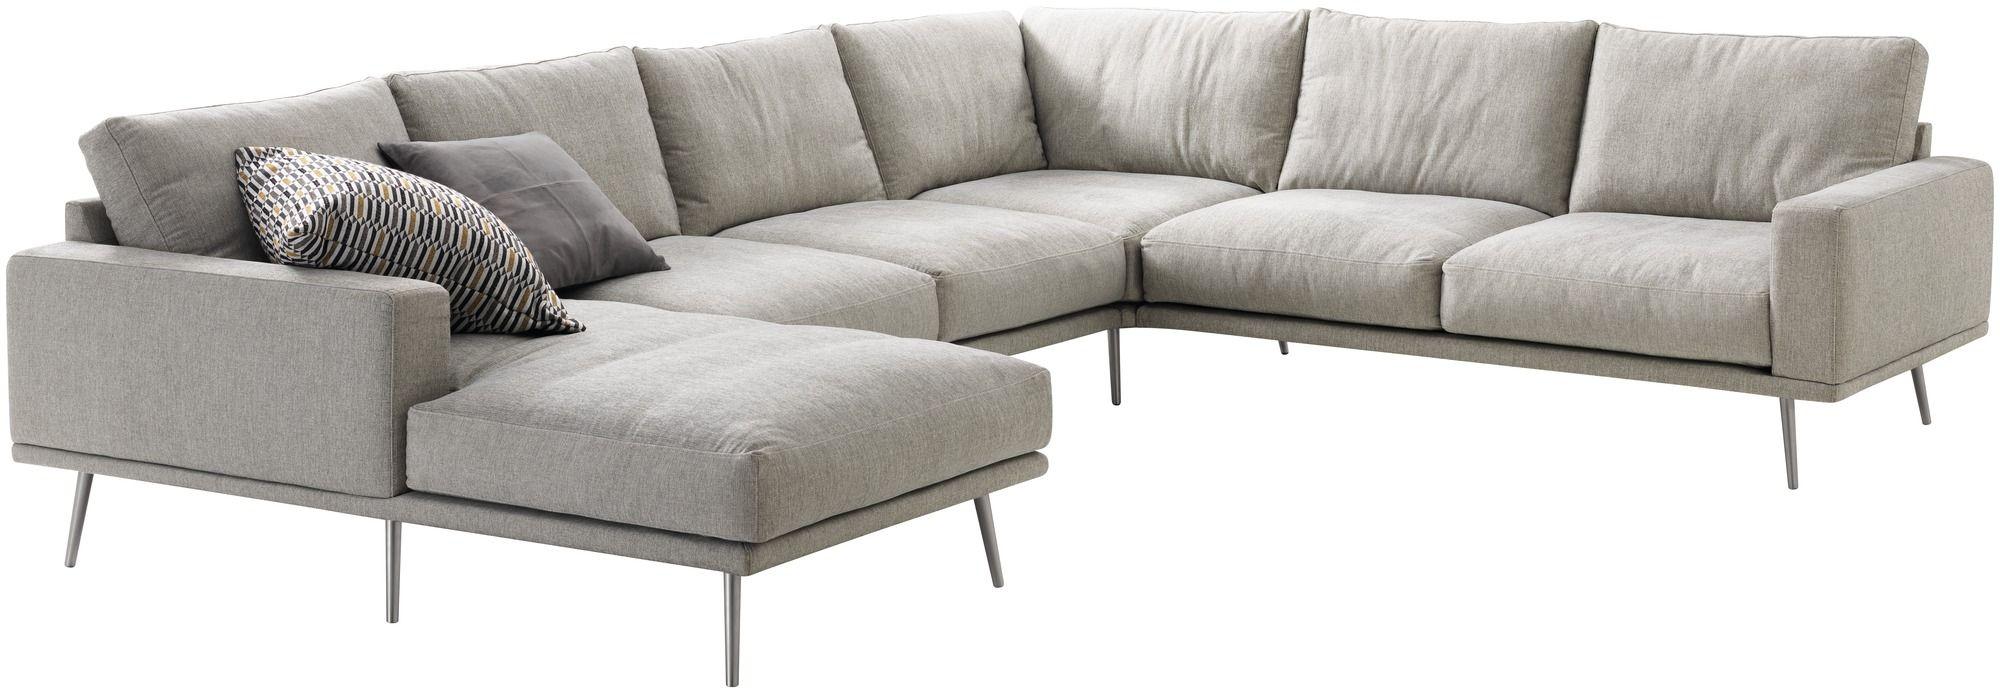 Carlton Bo Concept Corner Sofa Corner Sofa Design Sofa Design